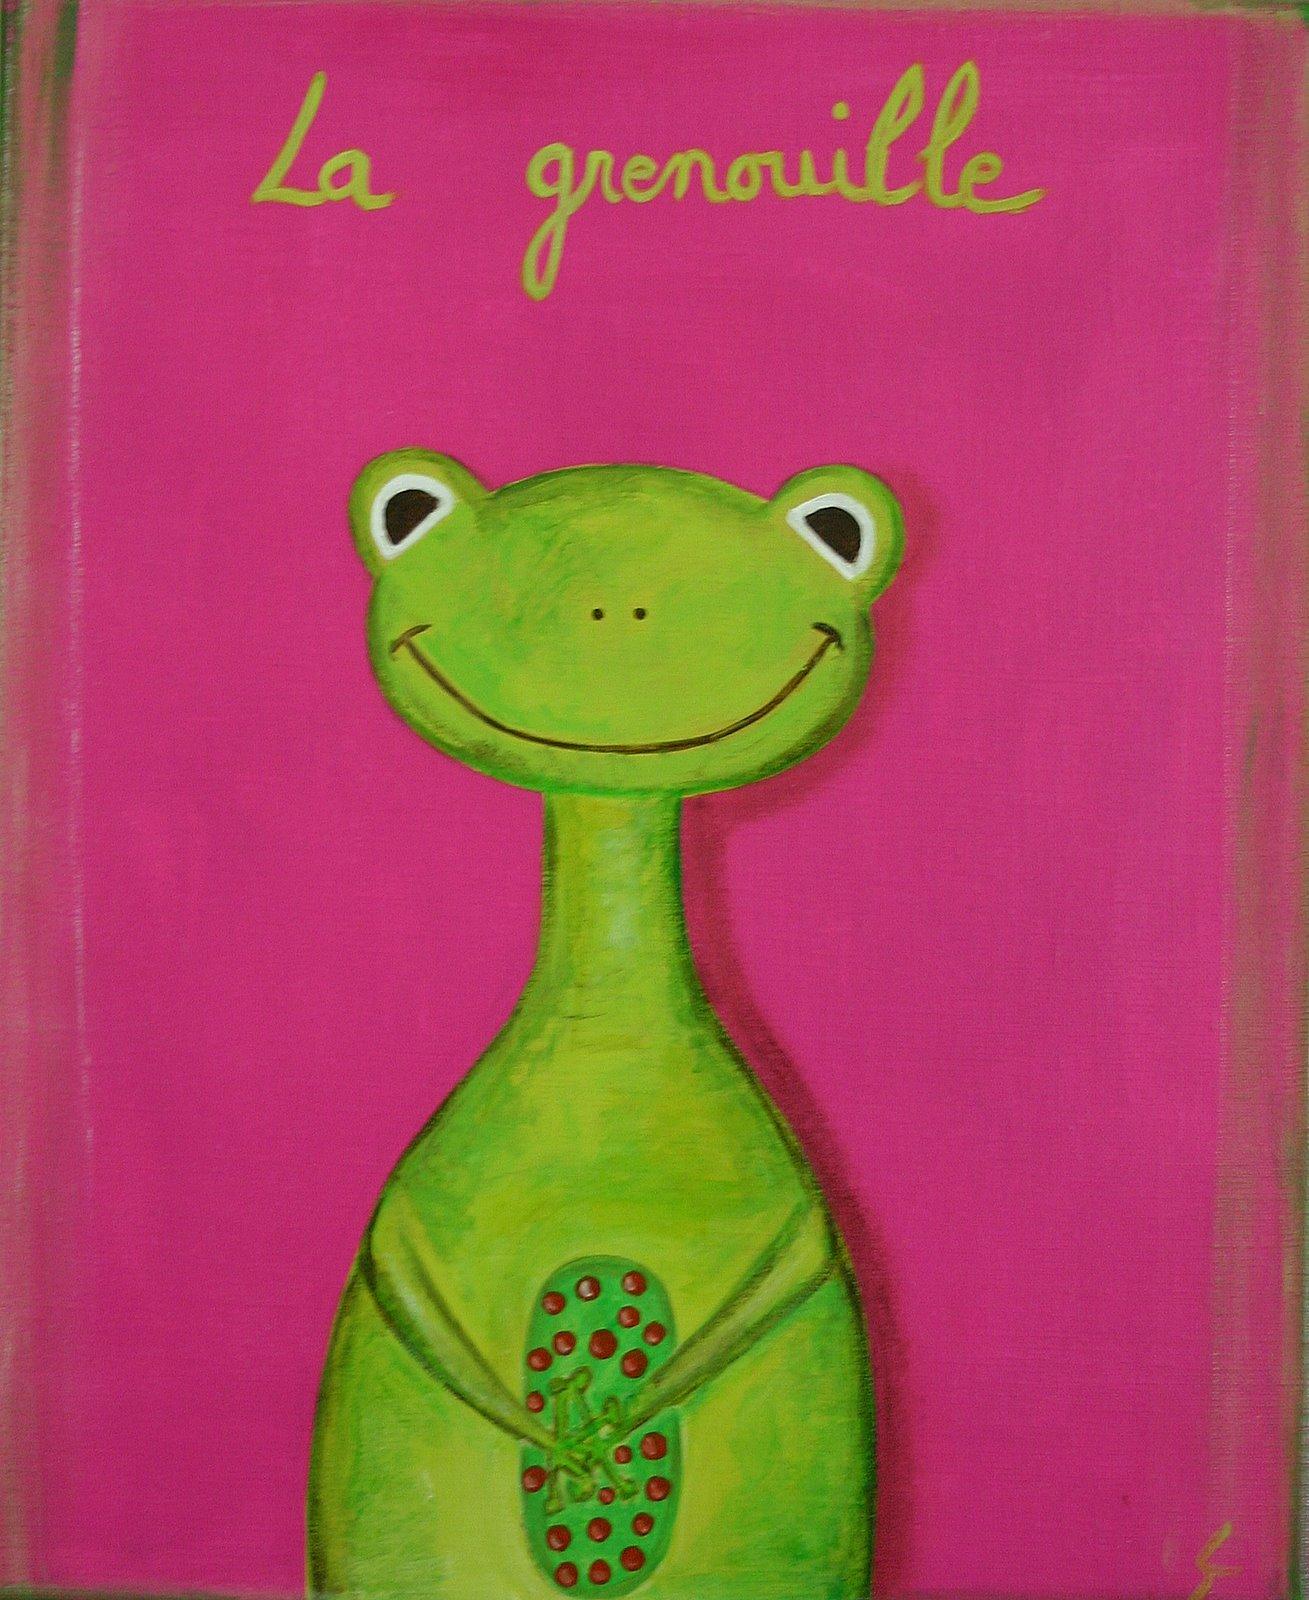 Tableau Contemporain, La grenouille verte. Sophie Costa, artiste peintre.